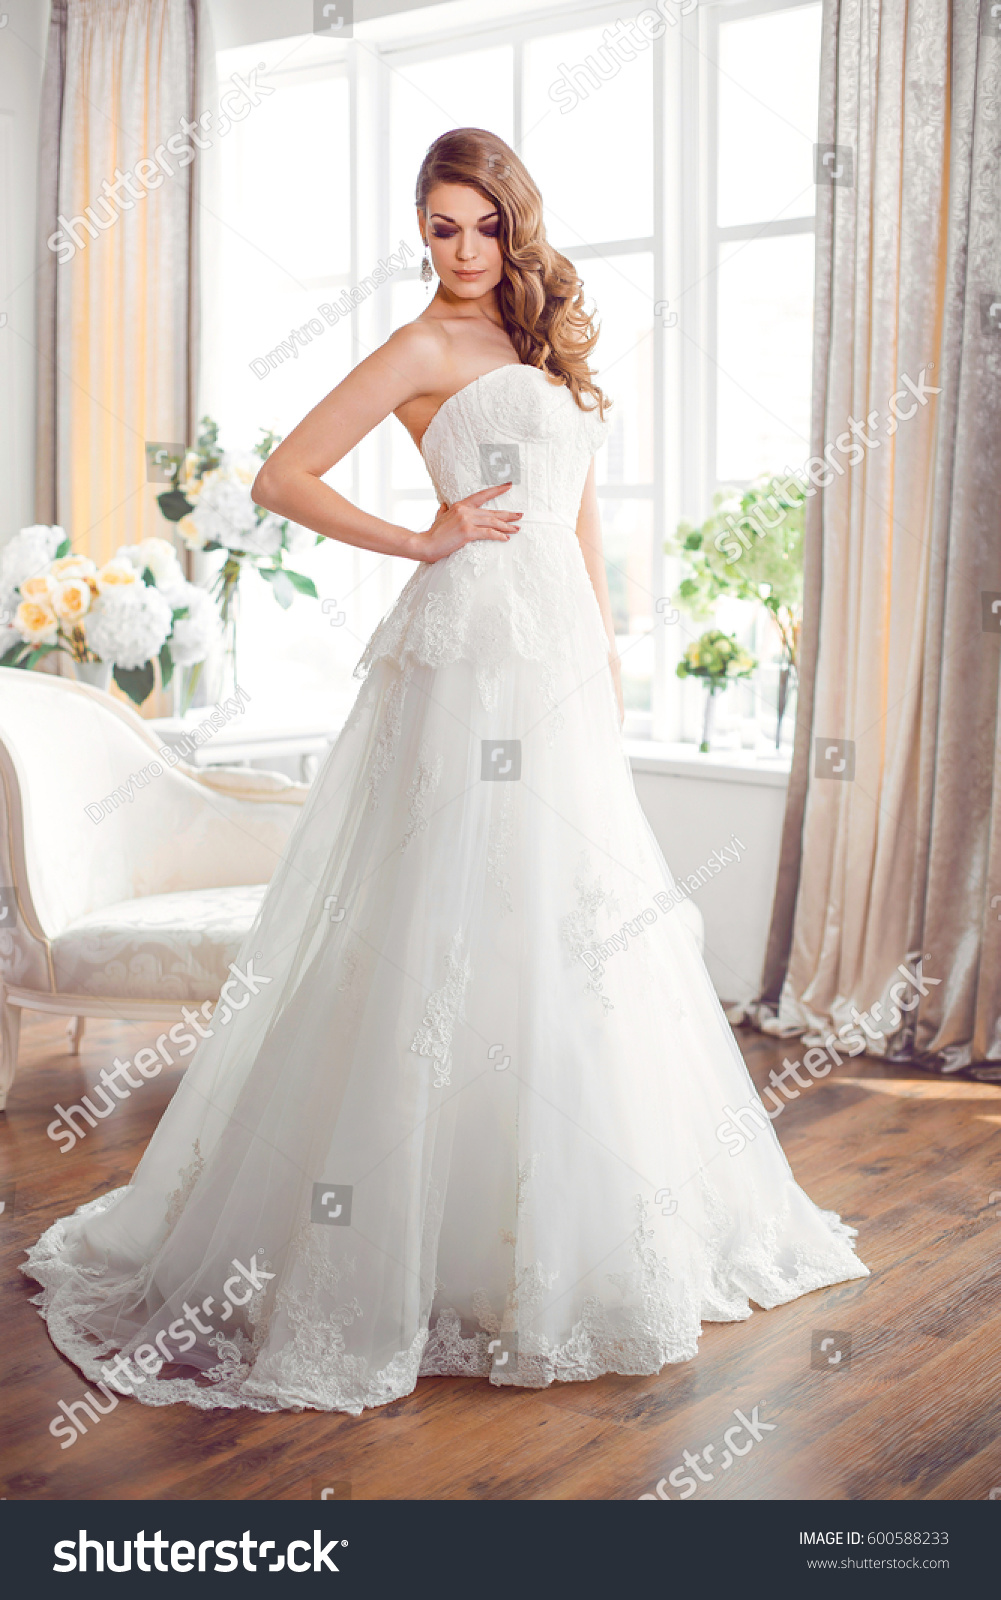 Wedding Fashion Bride Perfect Wedding White Stock Photo (Royalty ...